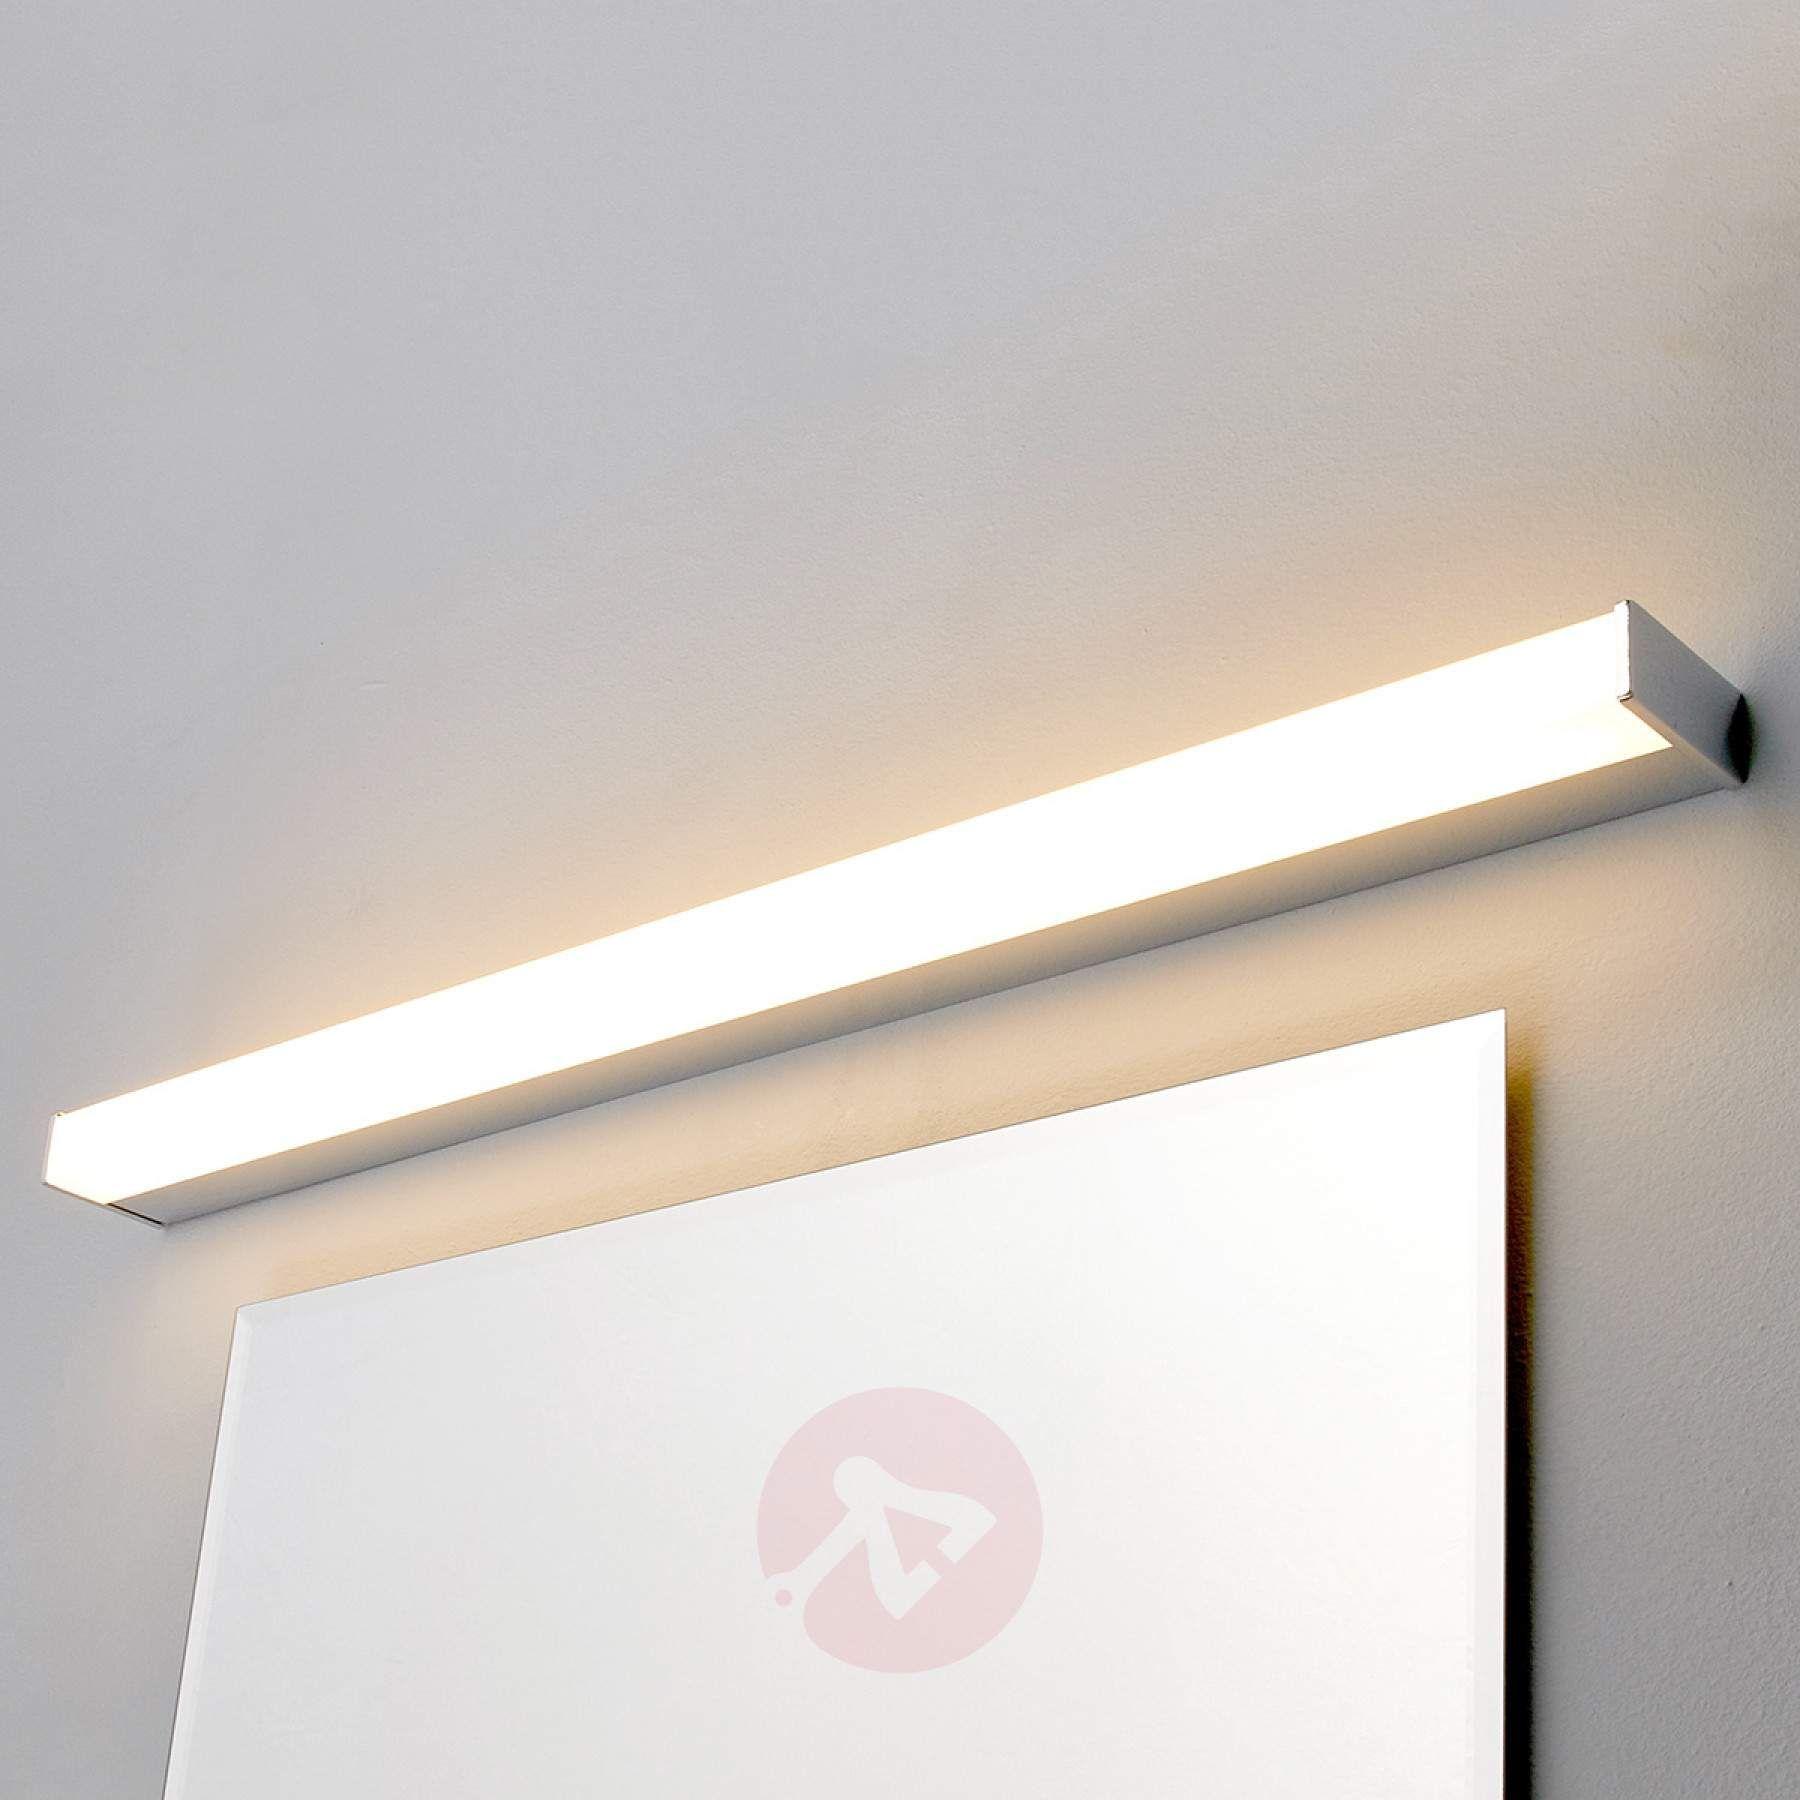 Oswietlenie Lustra Led Philippa Katowe 88cm Badezimmerspiegel